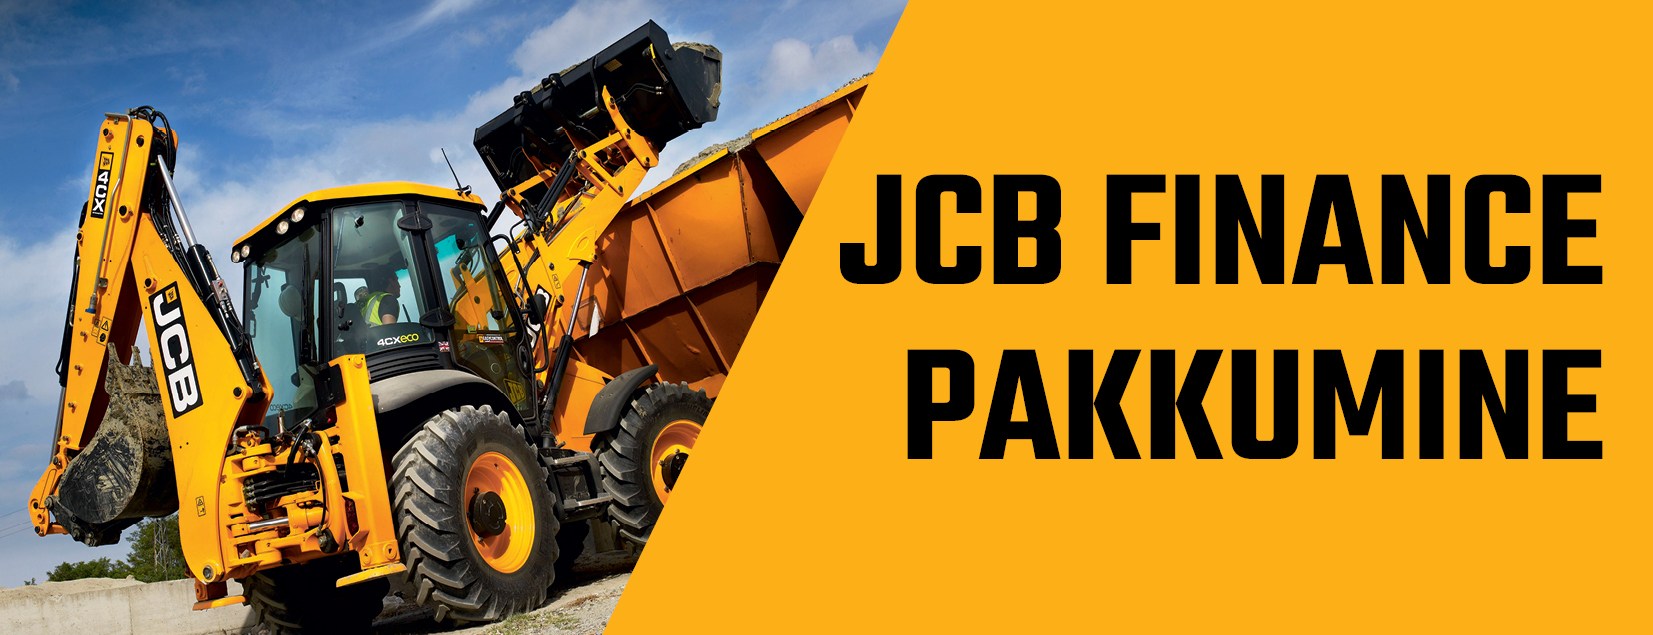 JCB Finance pakkumine